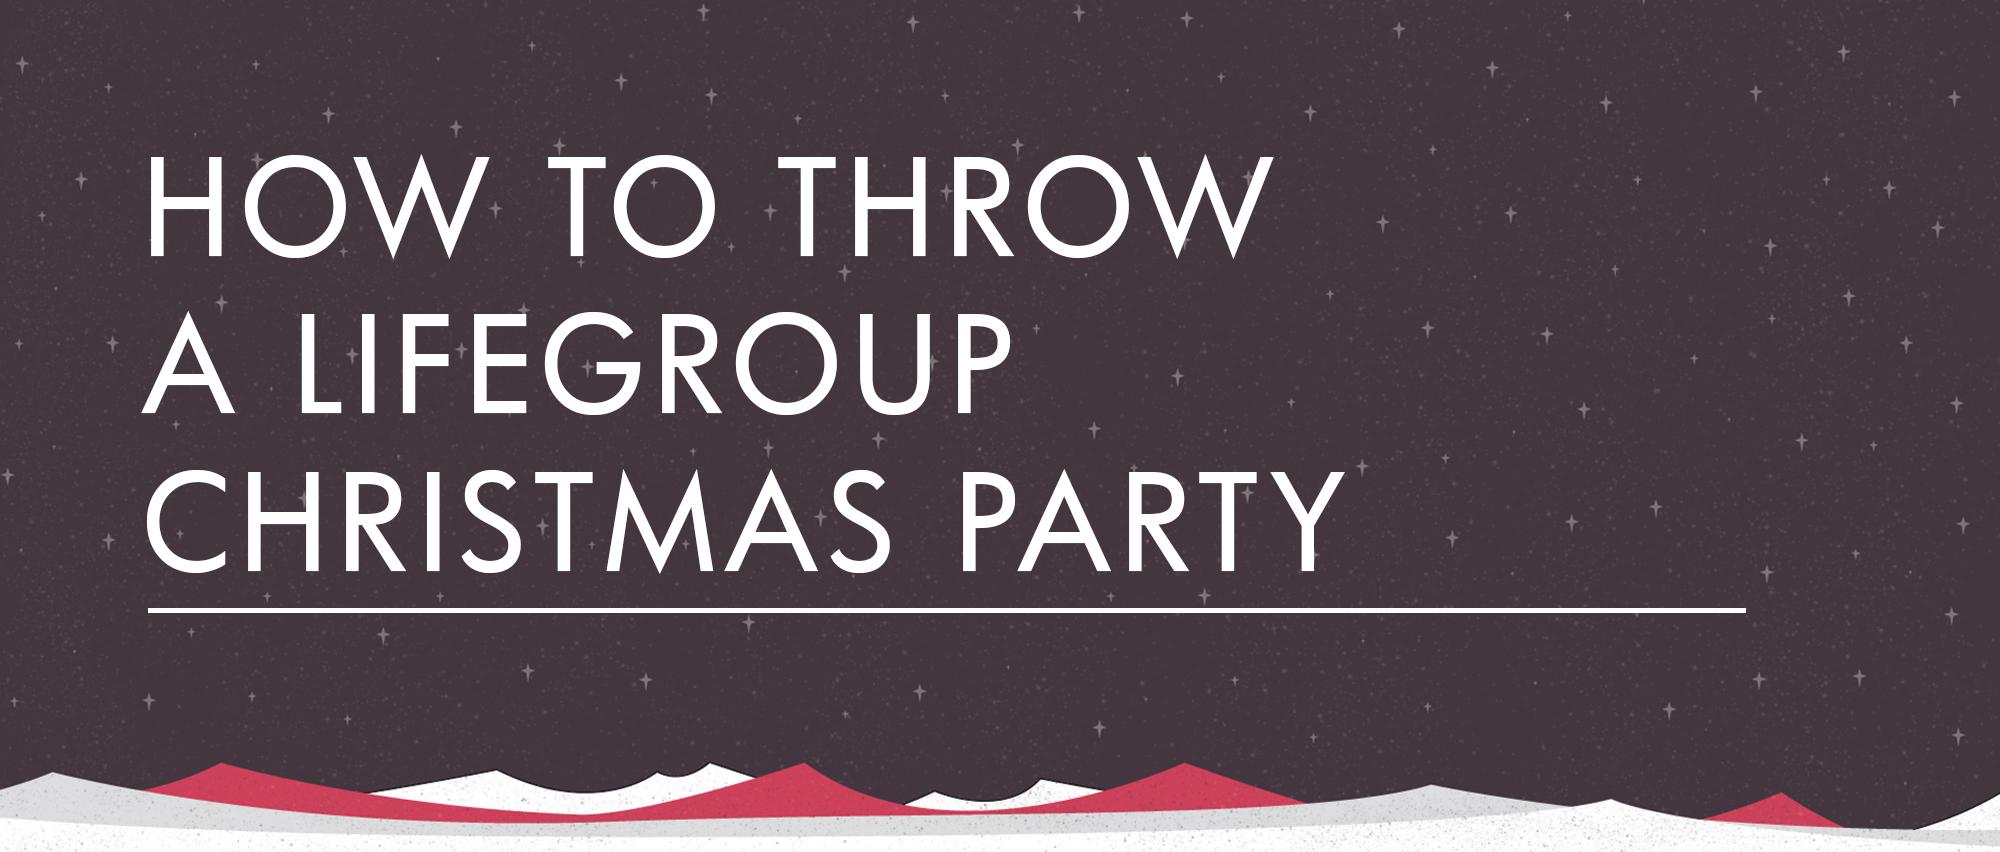 Giv_How_to_Throw_A_Lifegroup_Christmas_Party.jpg